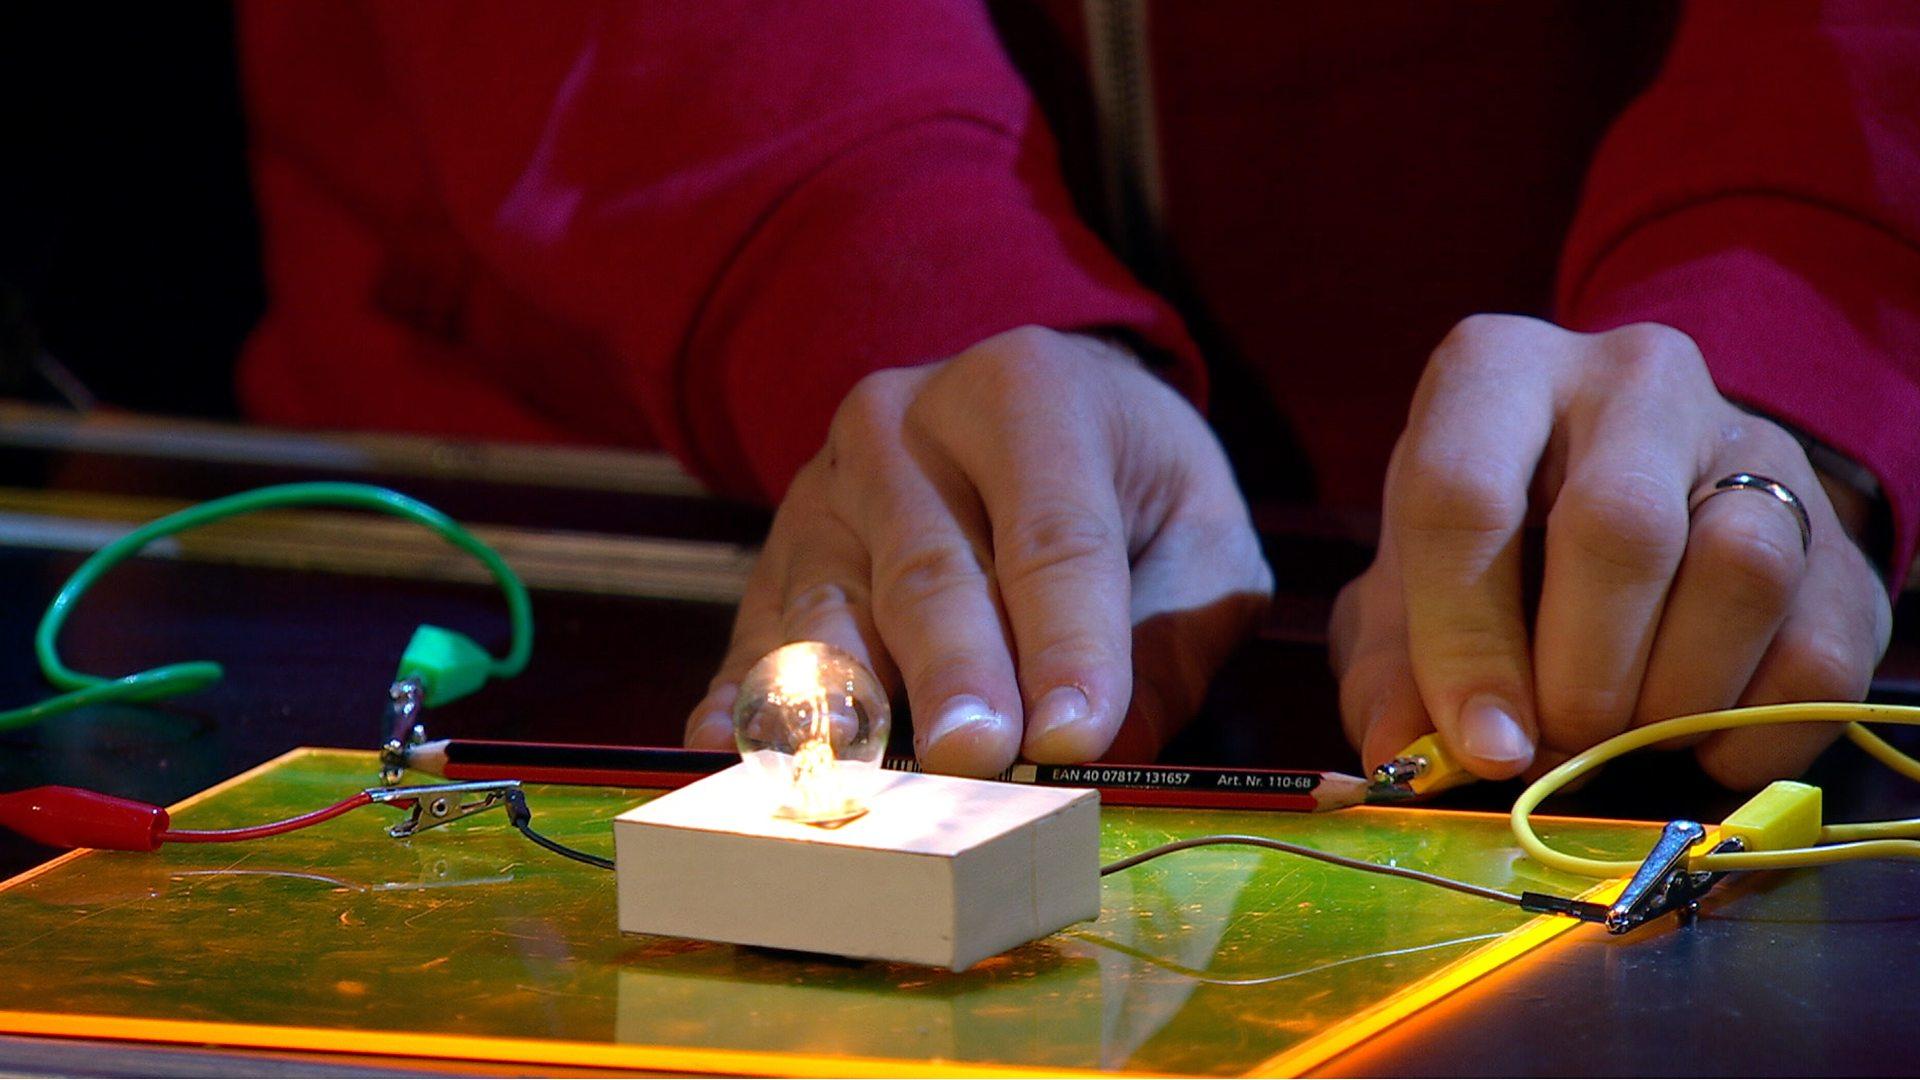 Bbc Live Lessons Get Scientific Lesson Fun Activity Teaching Electricity